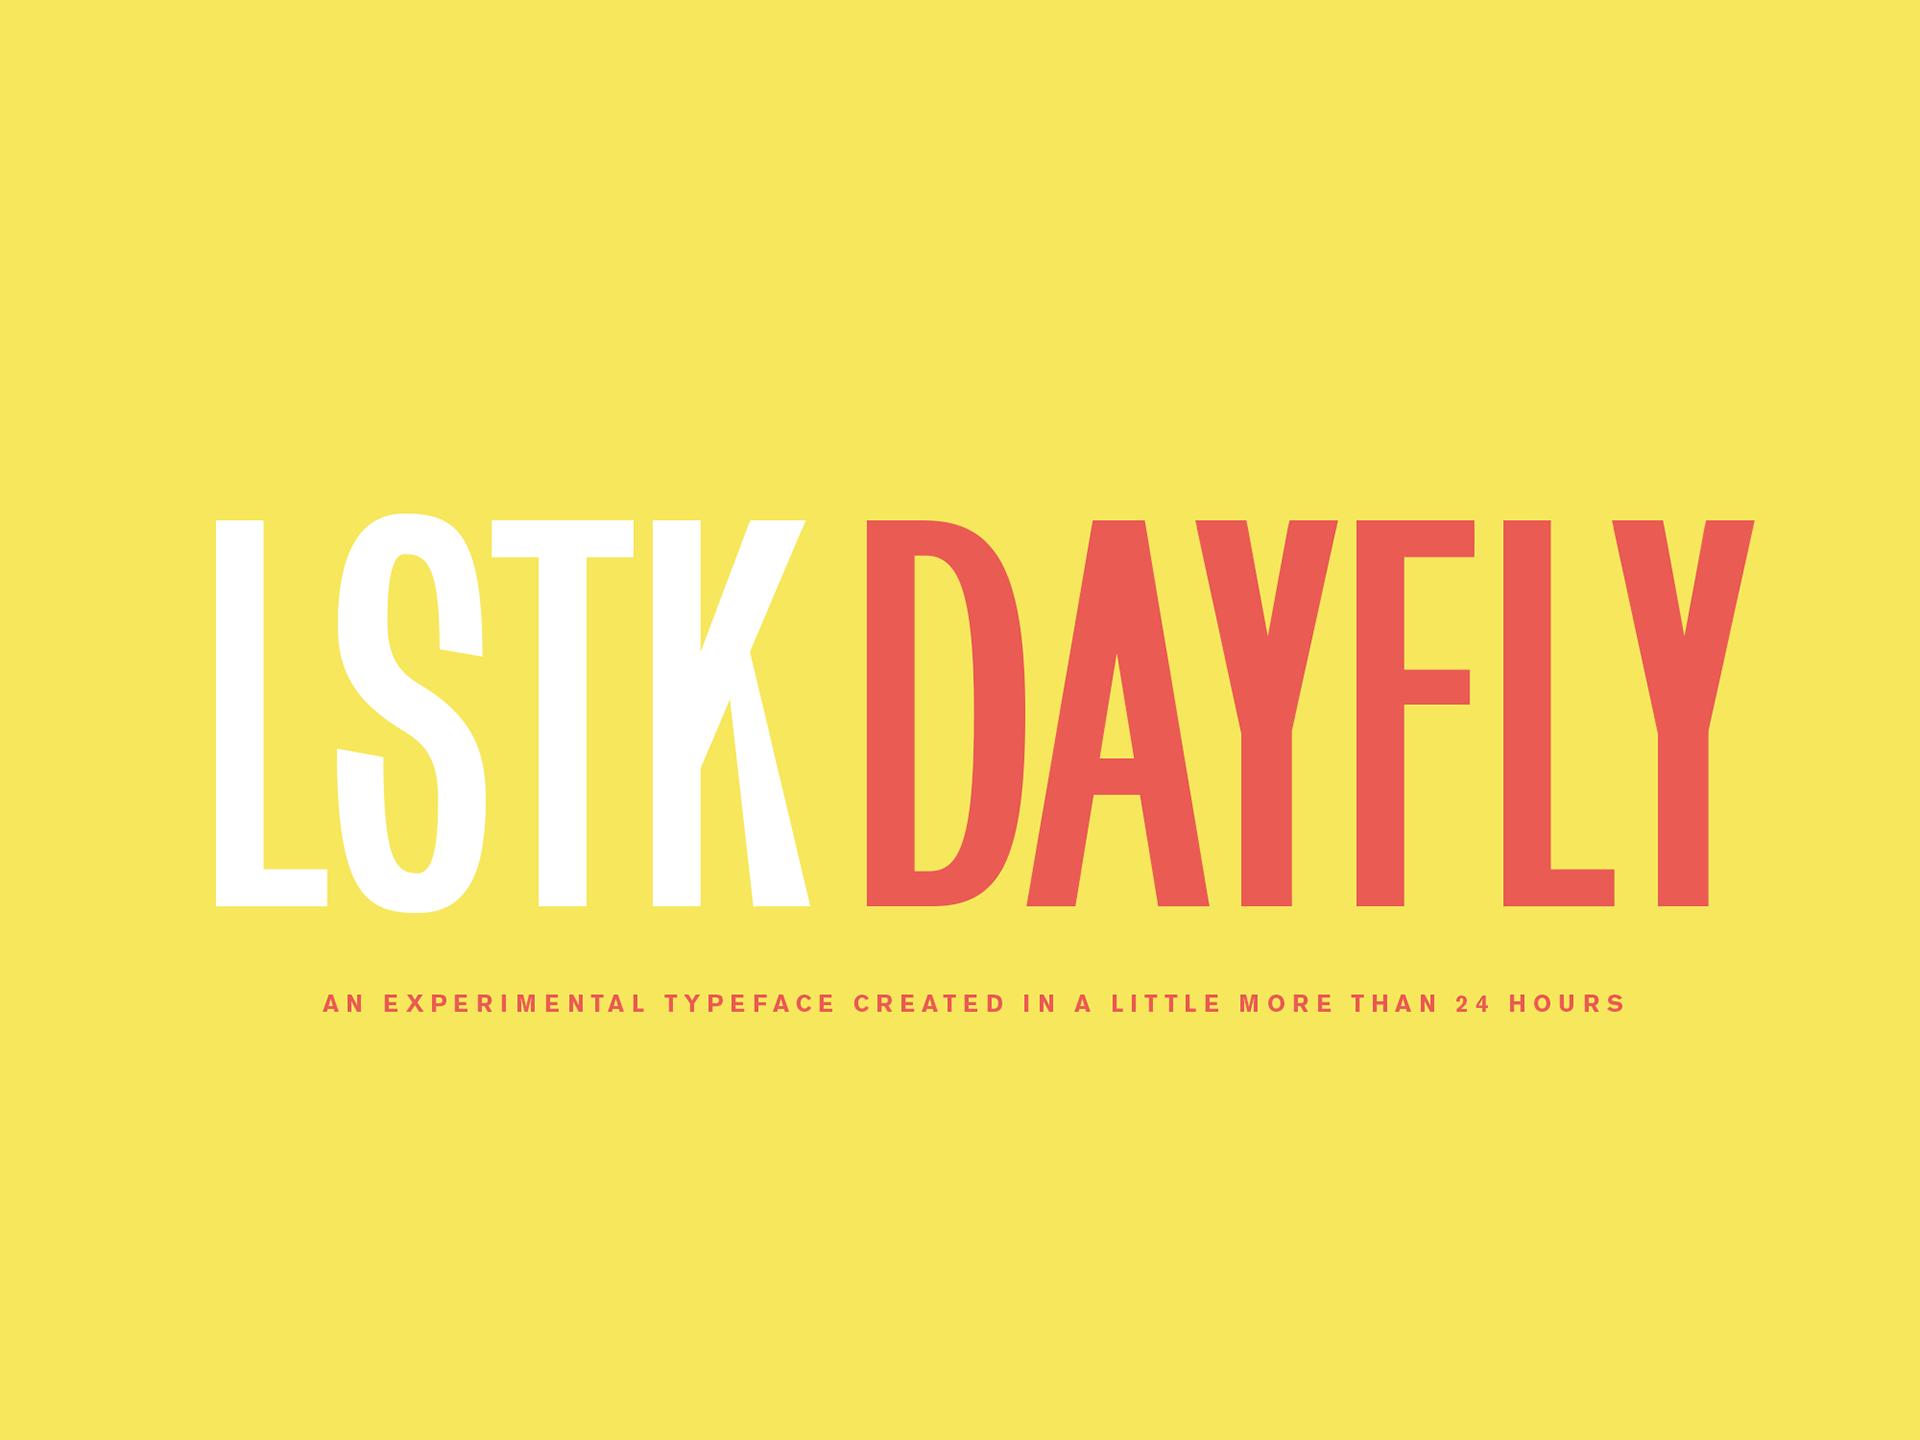 LSTK Dayfly Free Font - sans-serif